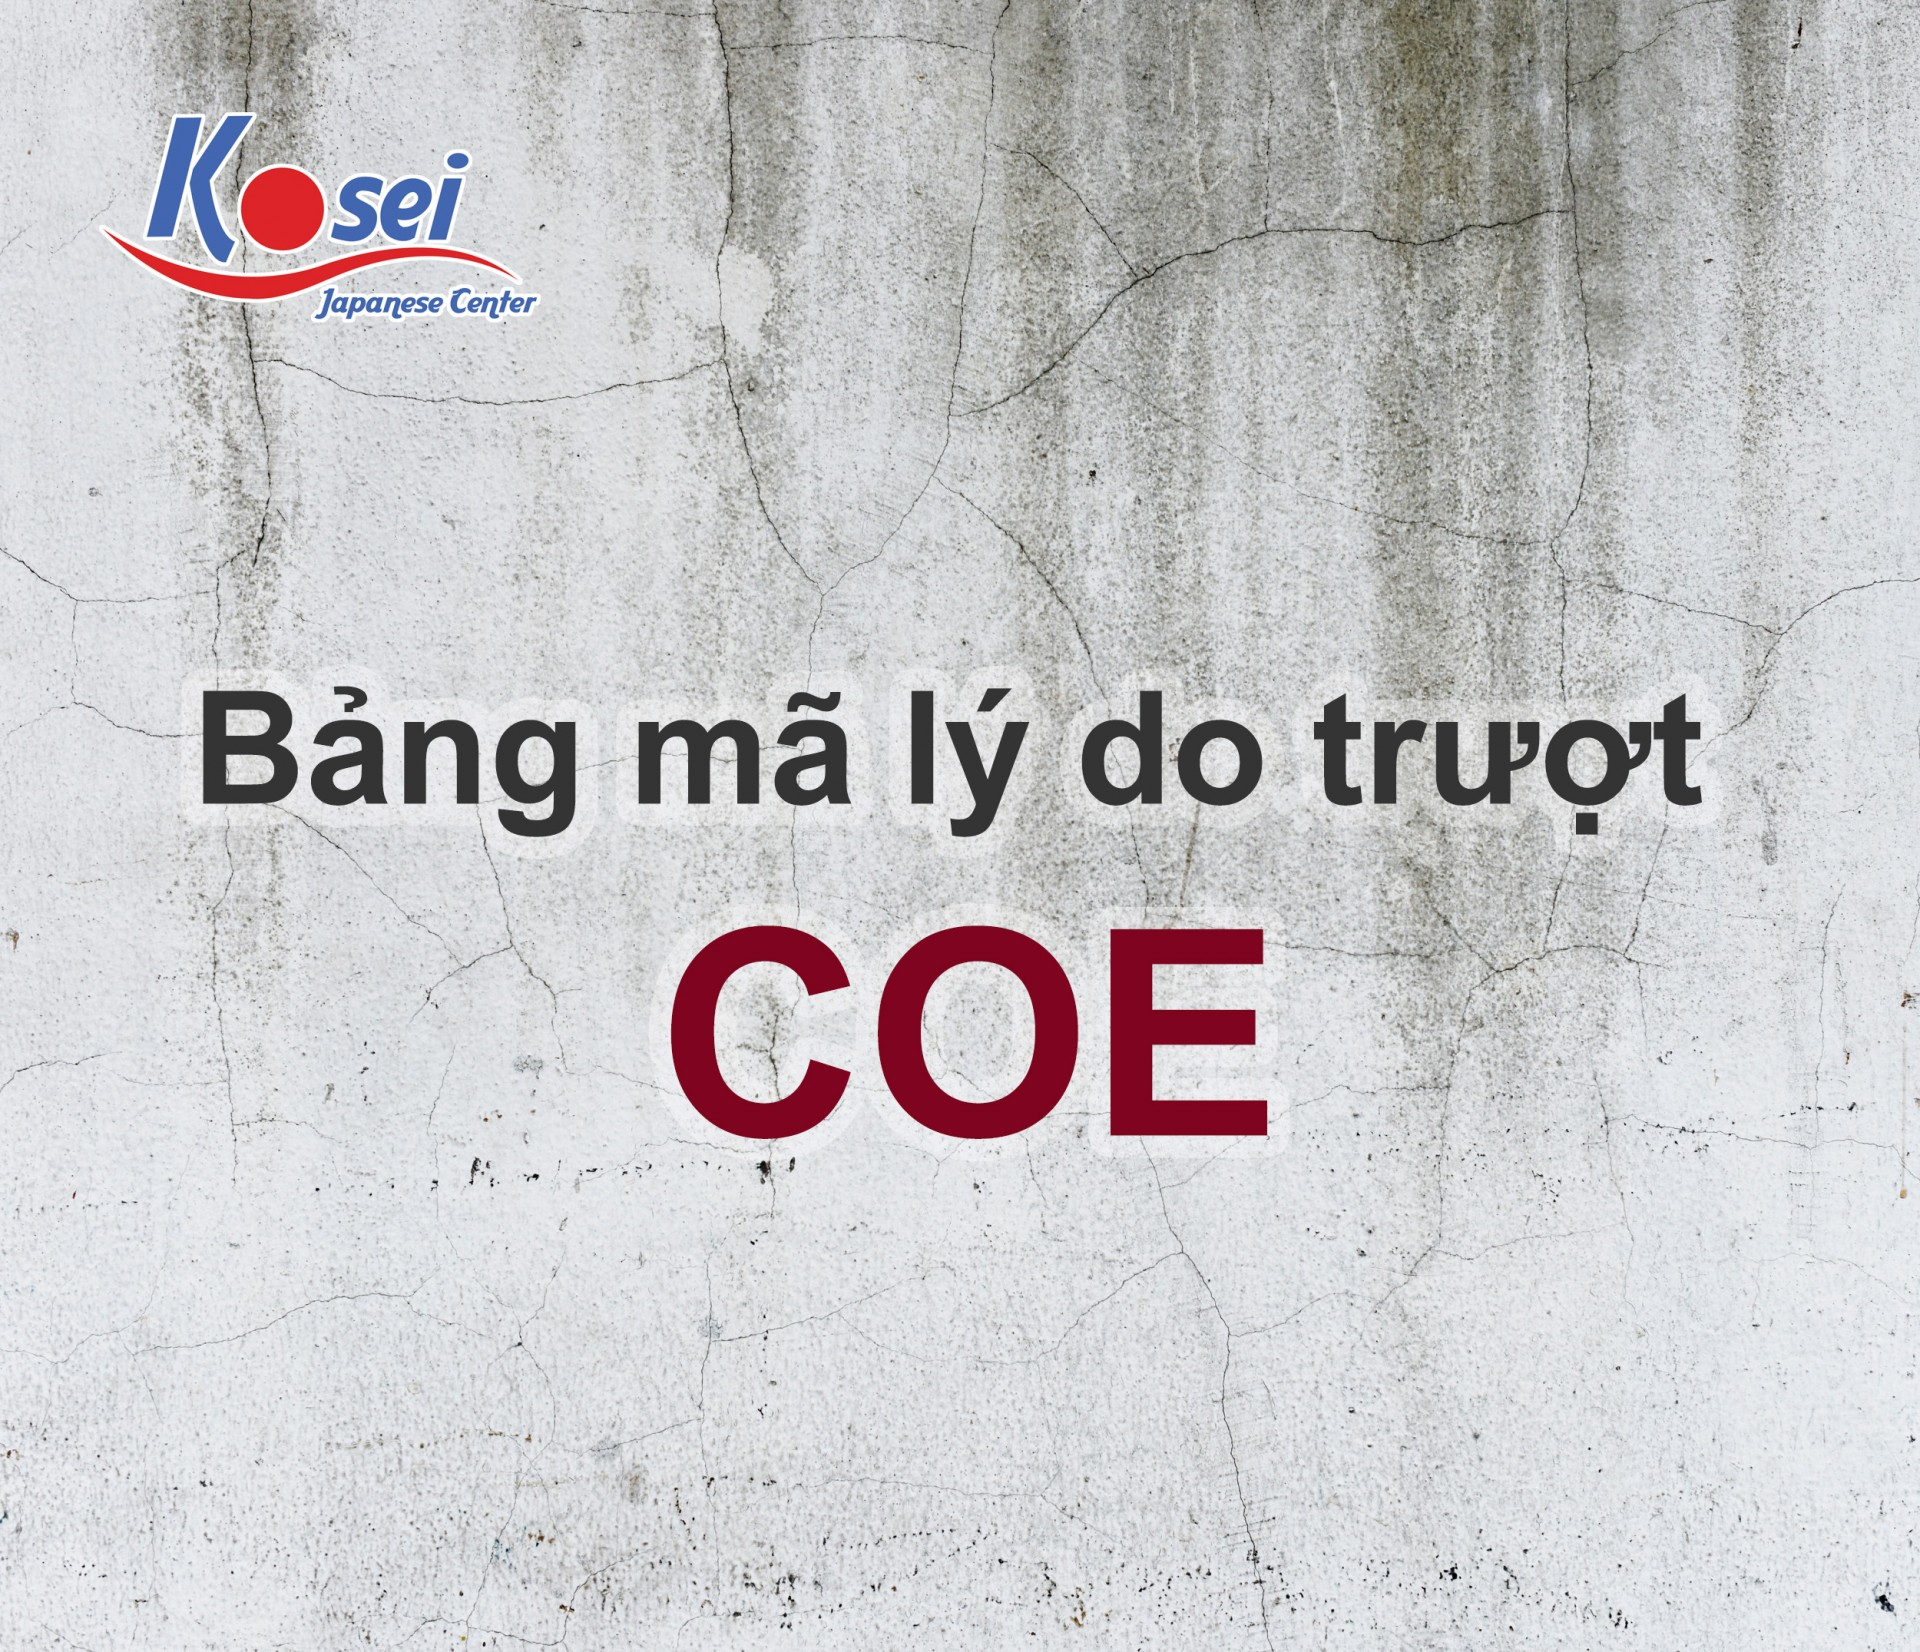 http://kosei.vn/bang-ma-truot-coe-du-hoc-nhat-ban-n1501.html